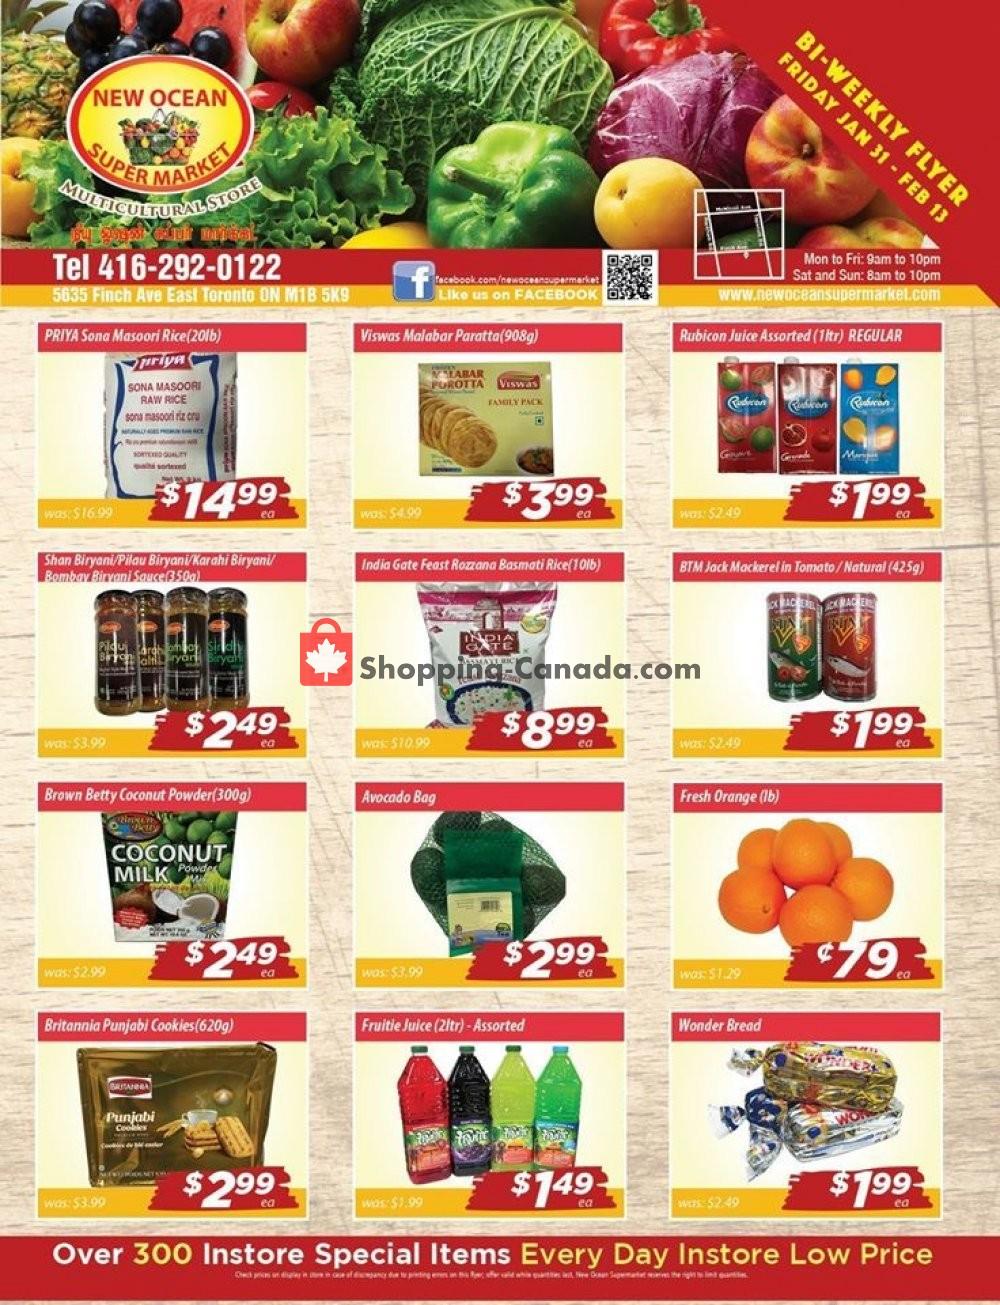 Flyer New Ocean Supermarket Canada - from Friday January 31, 2020 to Thursday February 13, 2020